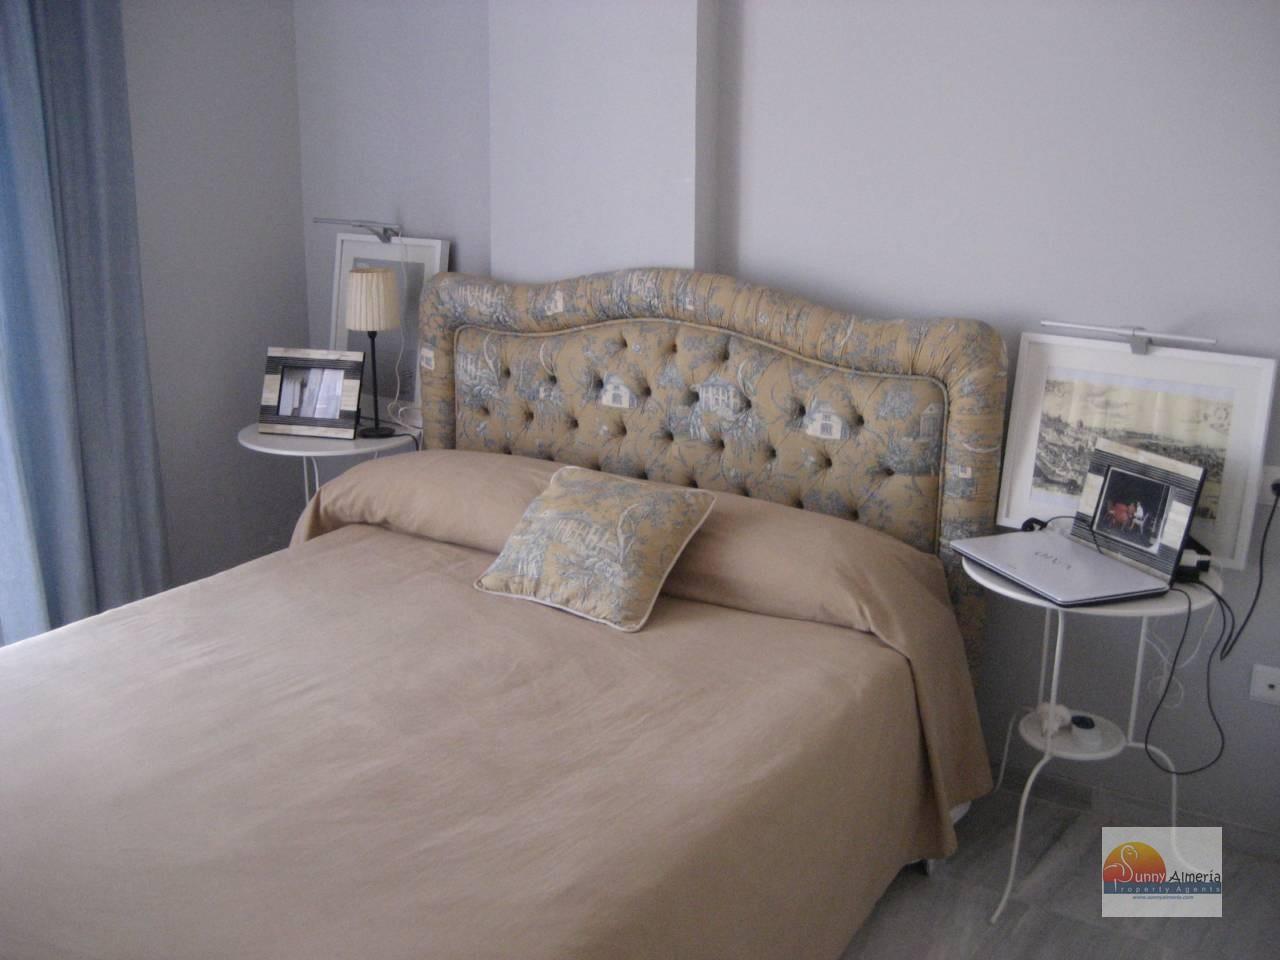 Apartment zum verkauf in av rosita ferrer 4 (Roquetas de Mar), 135.000 €